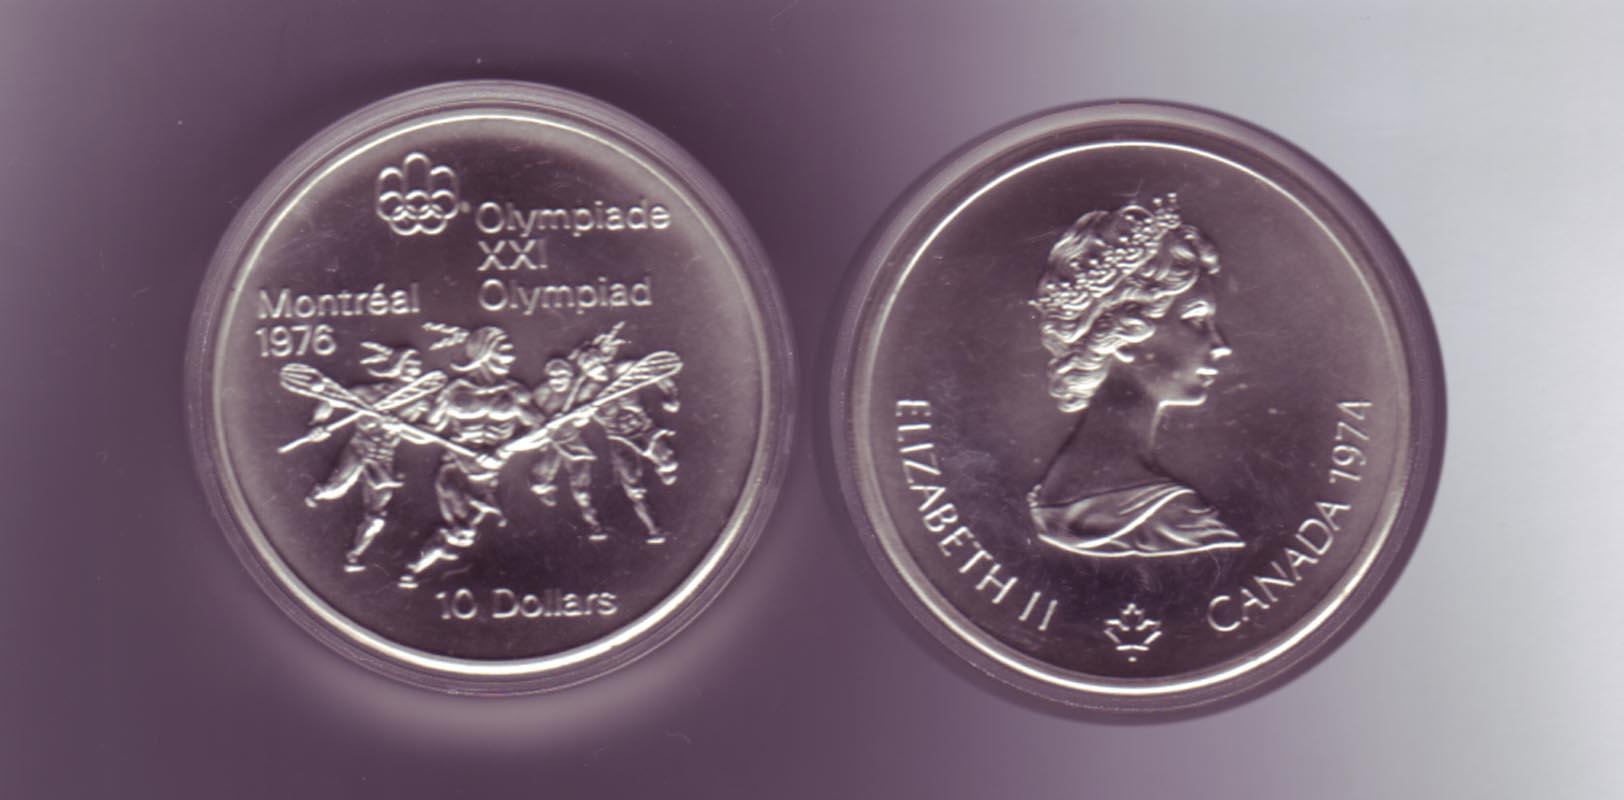 Silbermünze Kanada 10 Dollars Olympiade Montreal 1976 Lacrosse